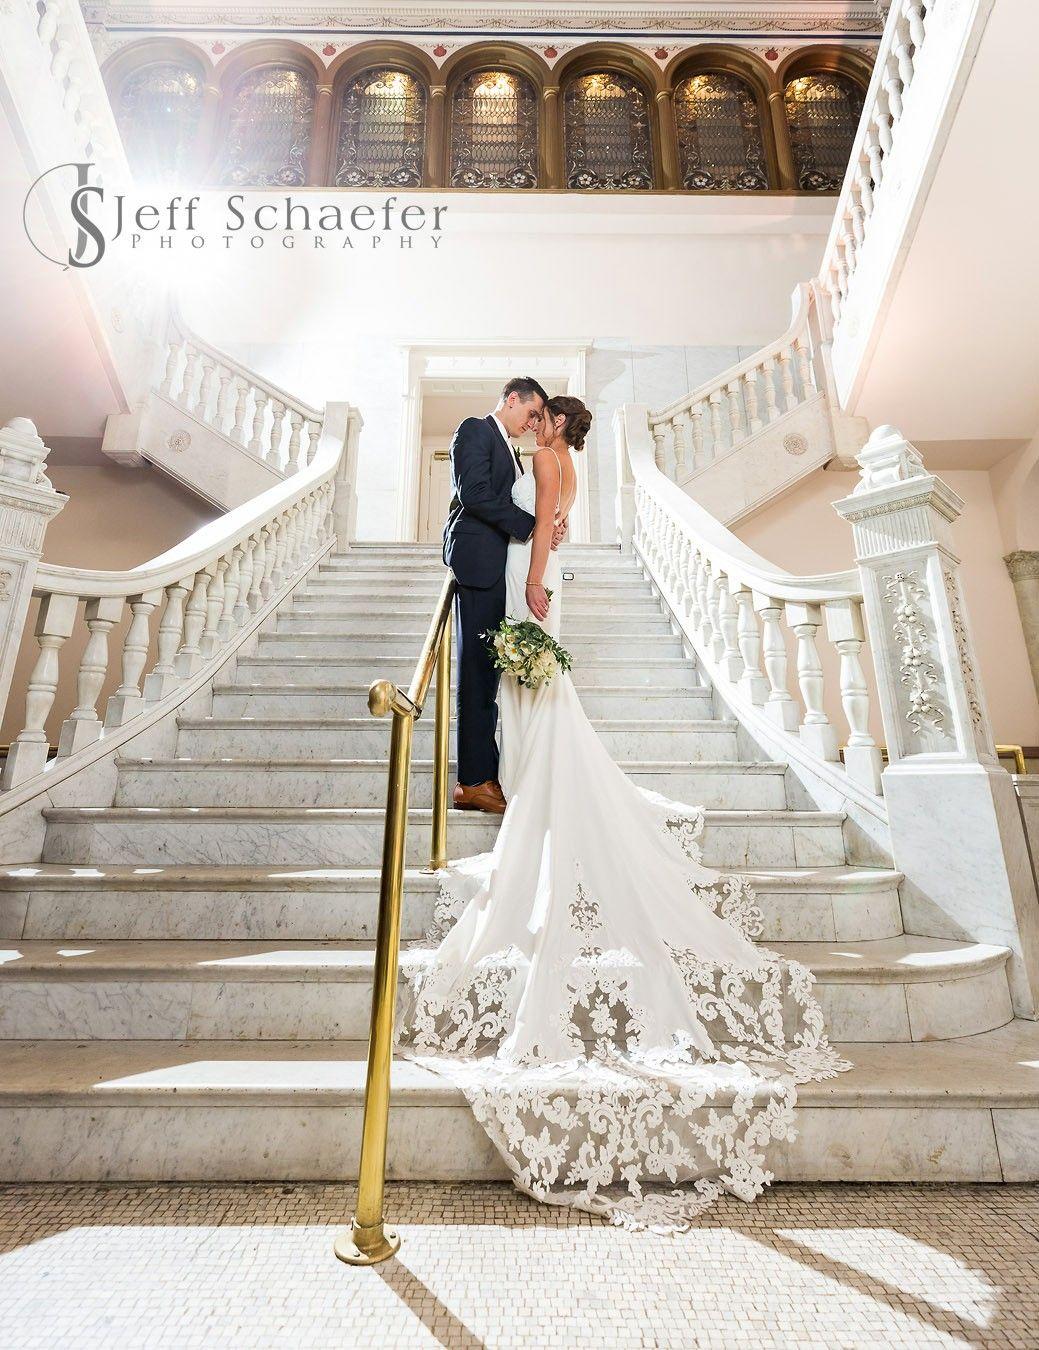 The Phoenix Cincinnati Wedding Photographers Jeff Schaefer Photography In 2020 Cincinnati Weddings Cincinnati Wedding Photographers Cincinnati Wedding Reception